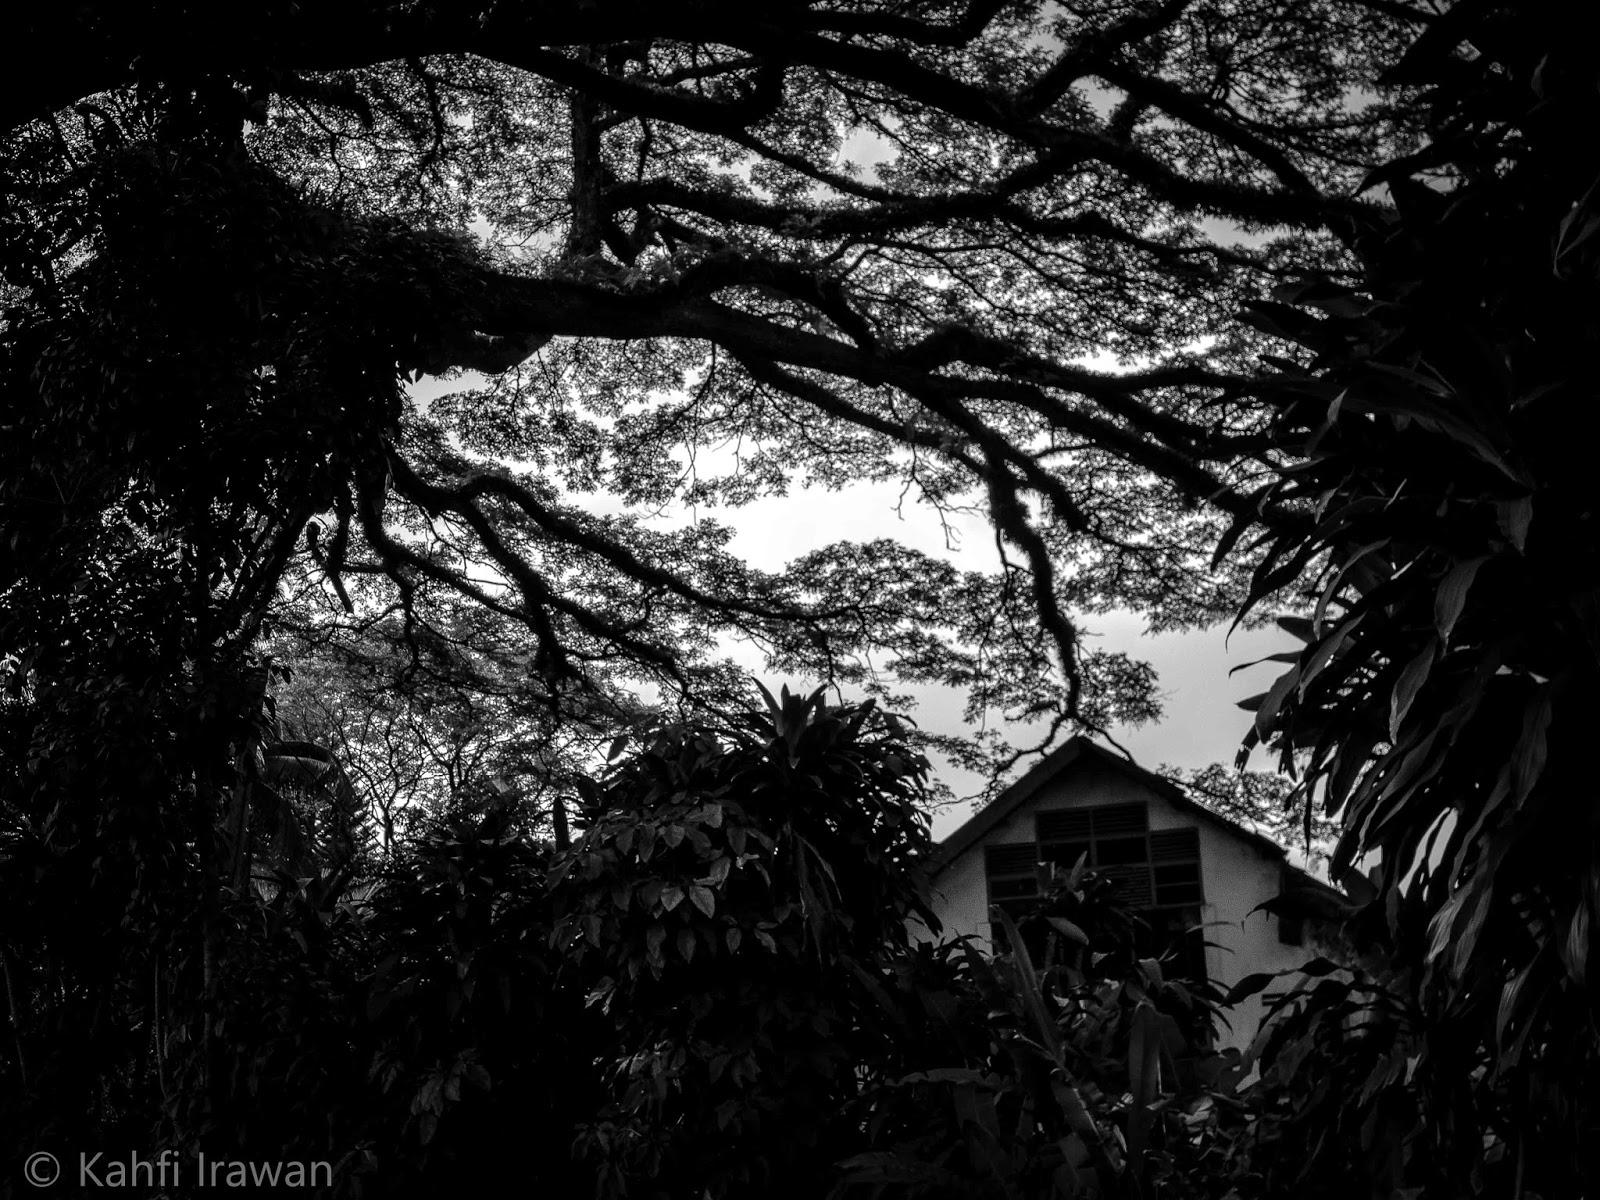 Landhuis Kuripan, sepenggal Sejarah di tanah Nyai Dasima